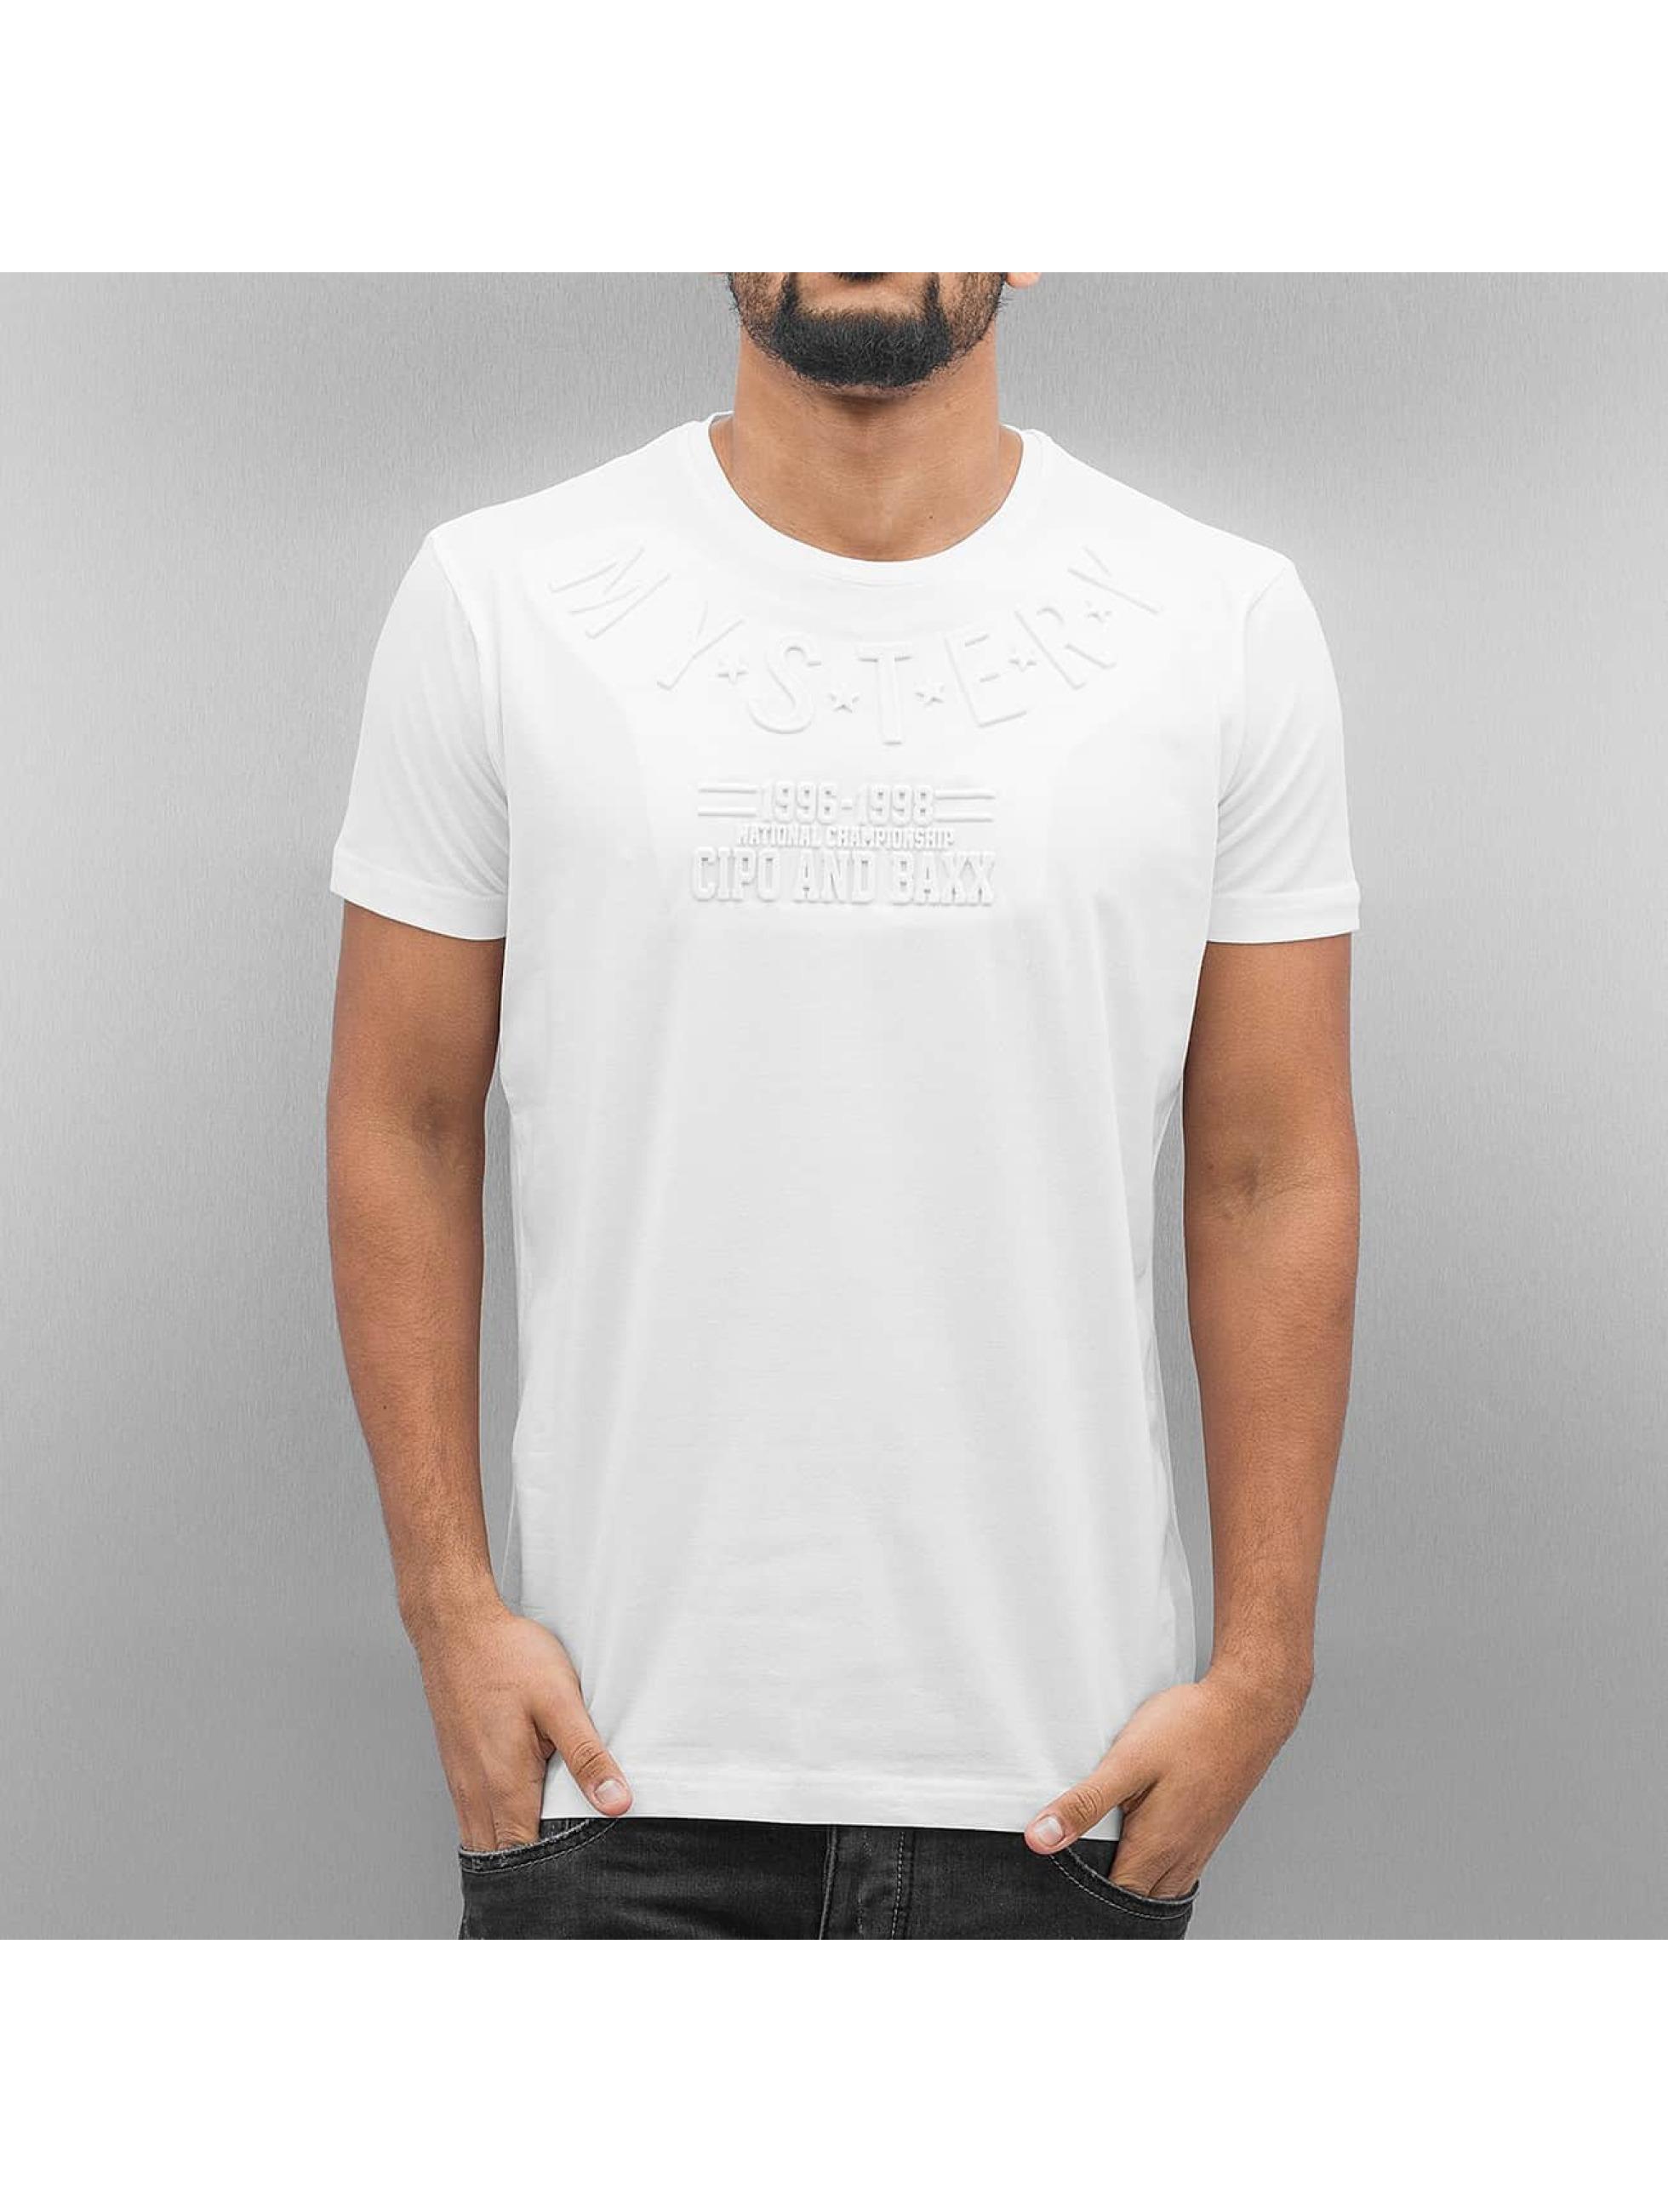 Cipo & Baxx T-Shirt Mystery white